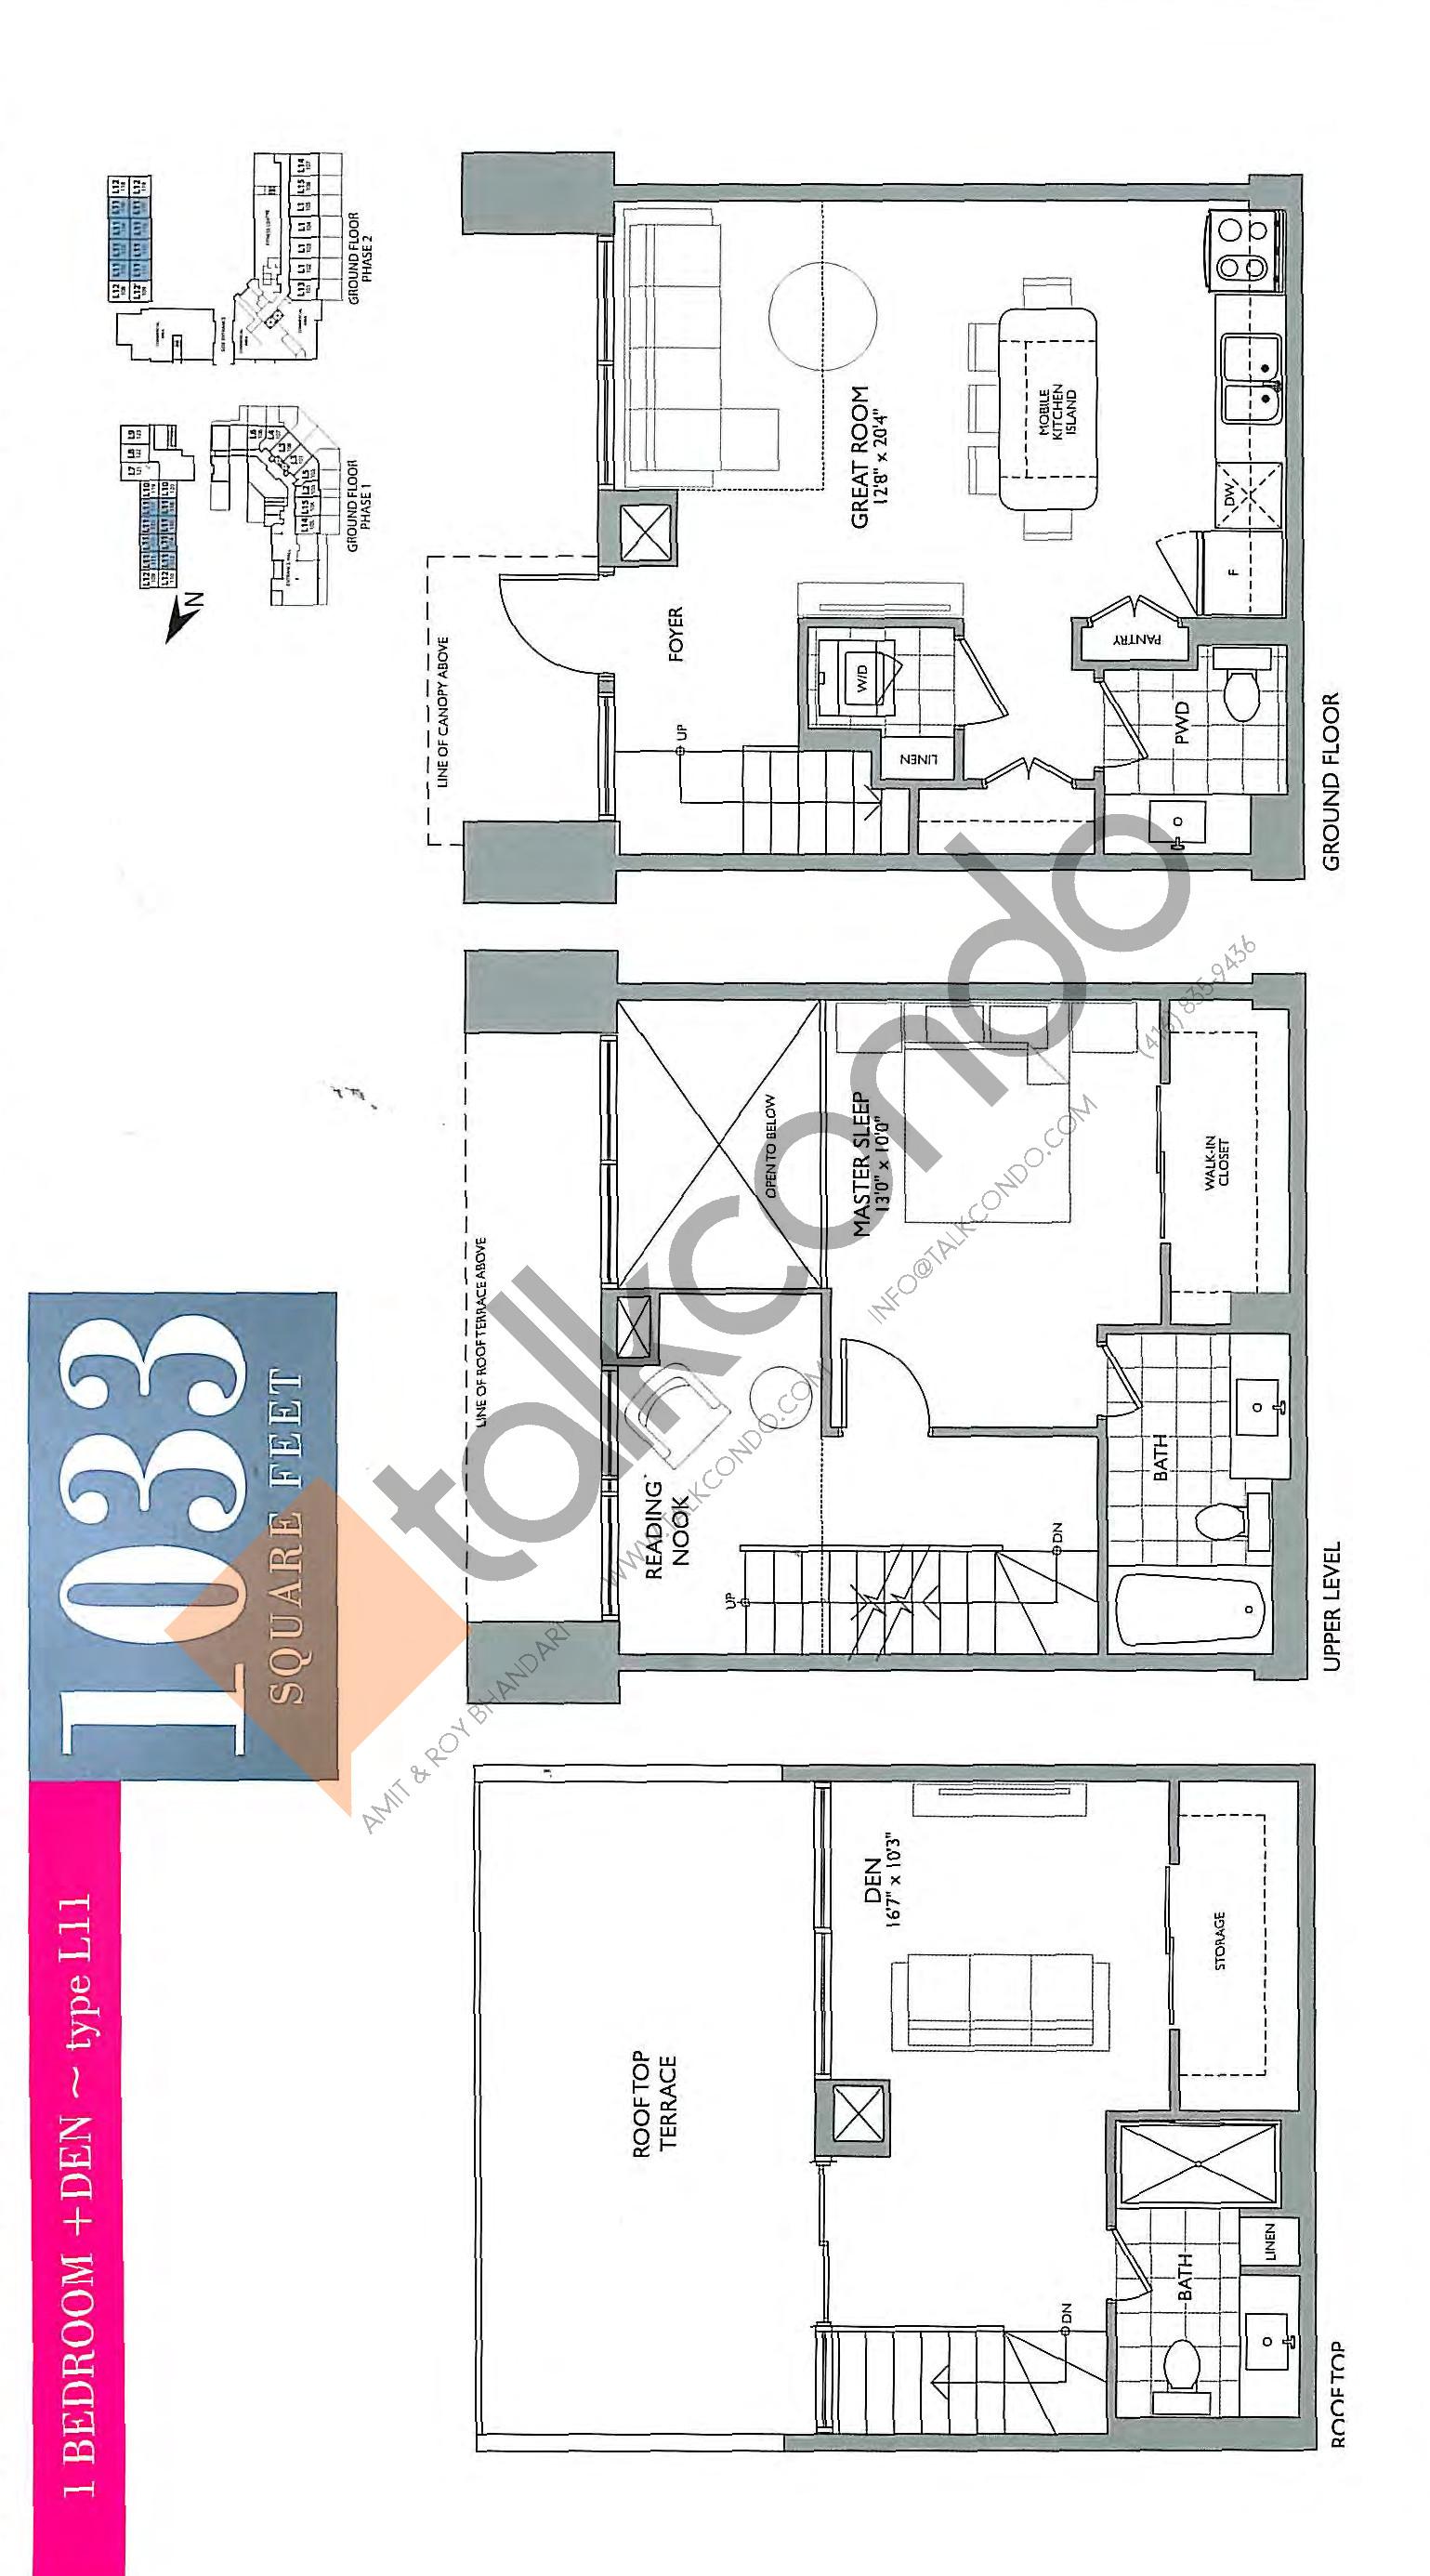 Allegra Condos Floor Plans Prices Availability Talkcondo